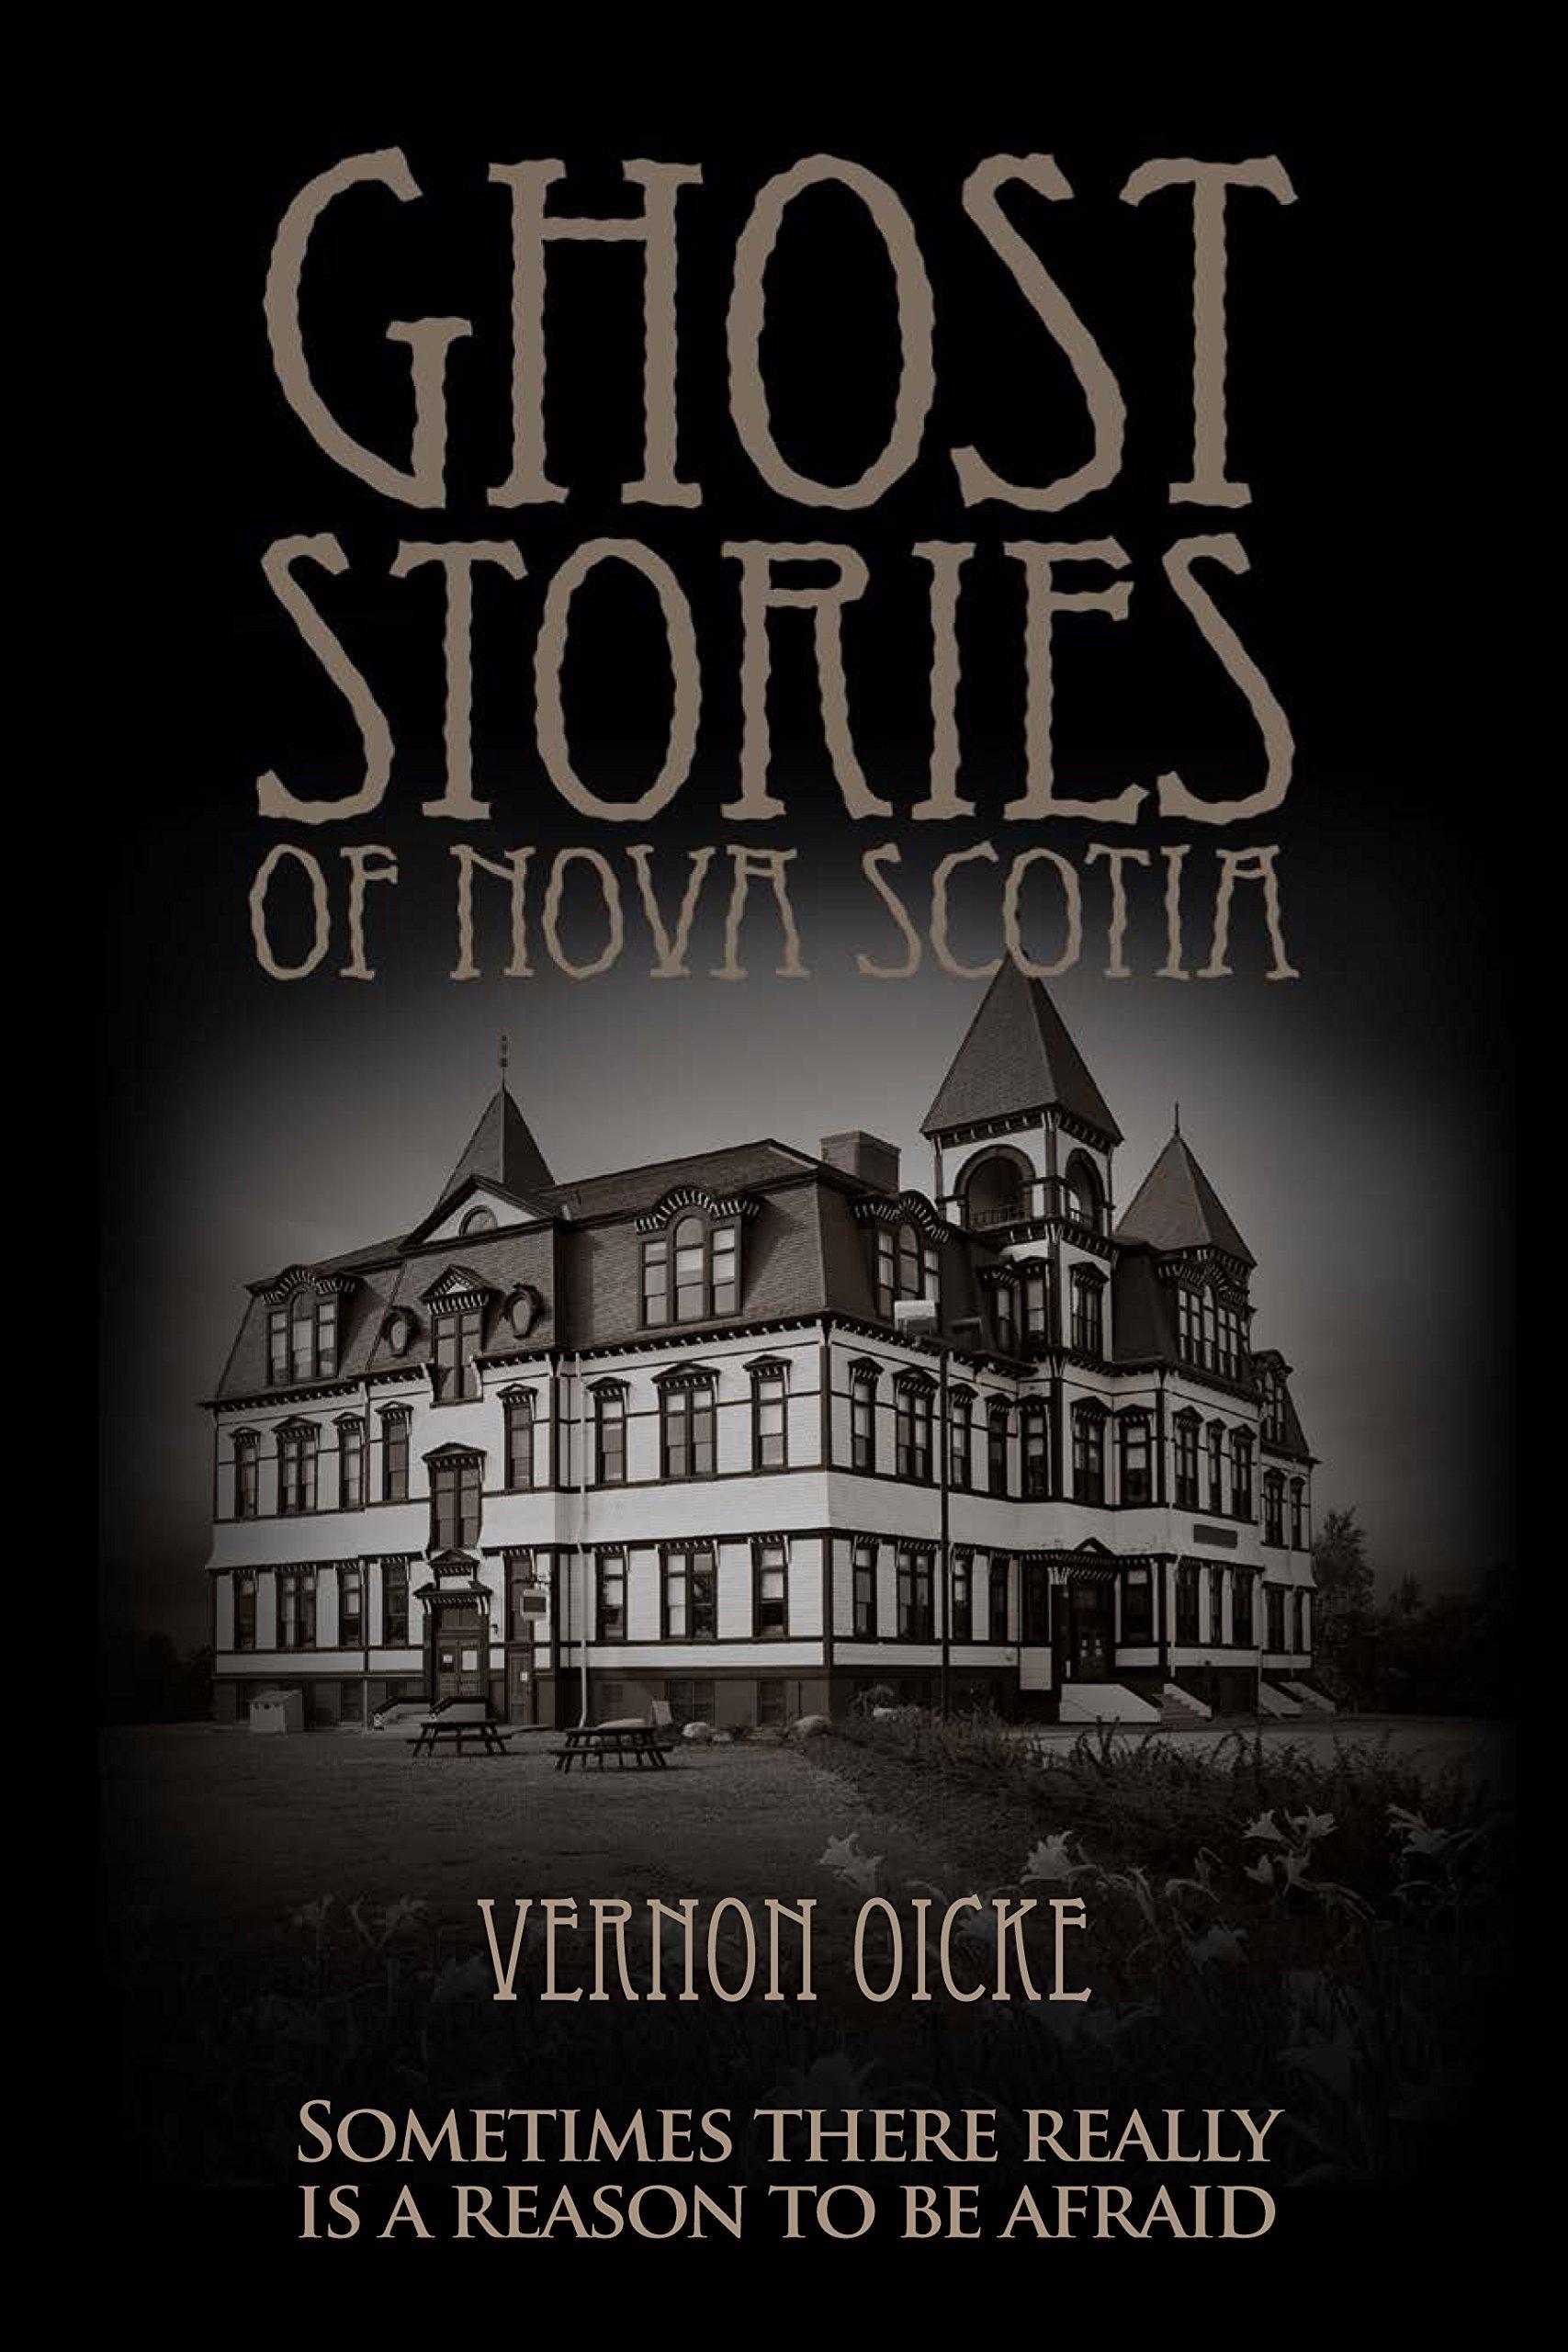 Ghost stories of nova scotia vernon oickle 9781927097779 books ghost stories of nova scotia vernon oickle 9781927097779 books amazon aiddatafo Gallery